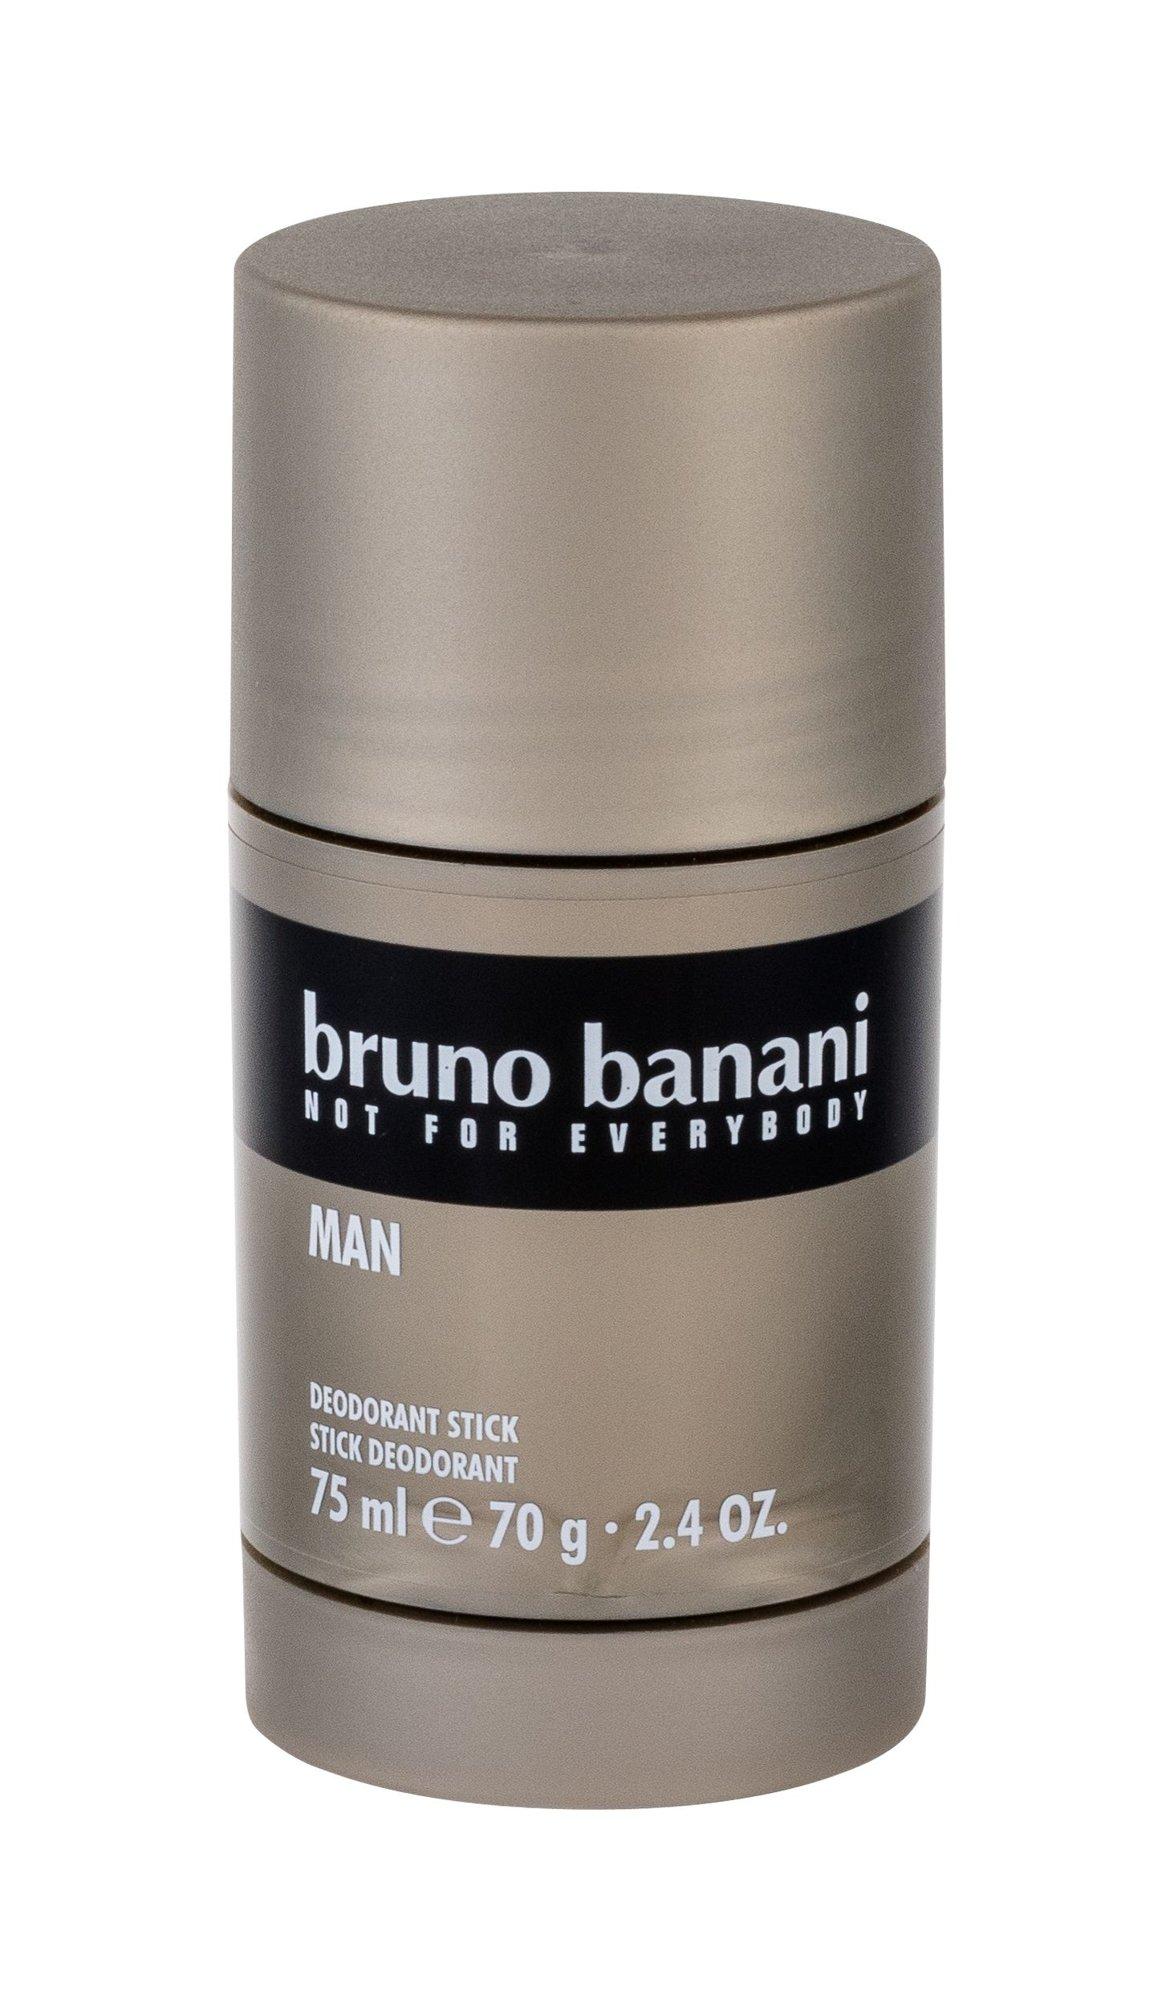 Bruno Banani Man Deodorant 75ml